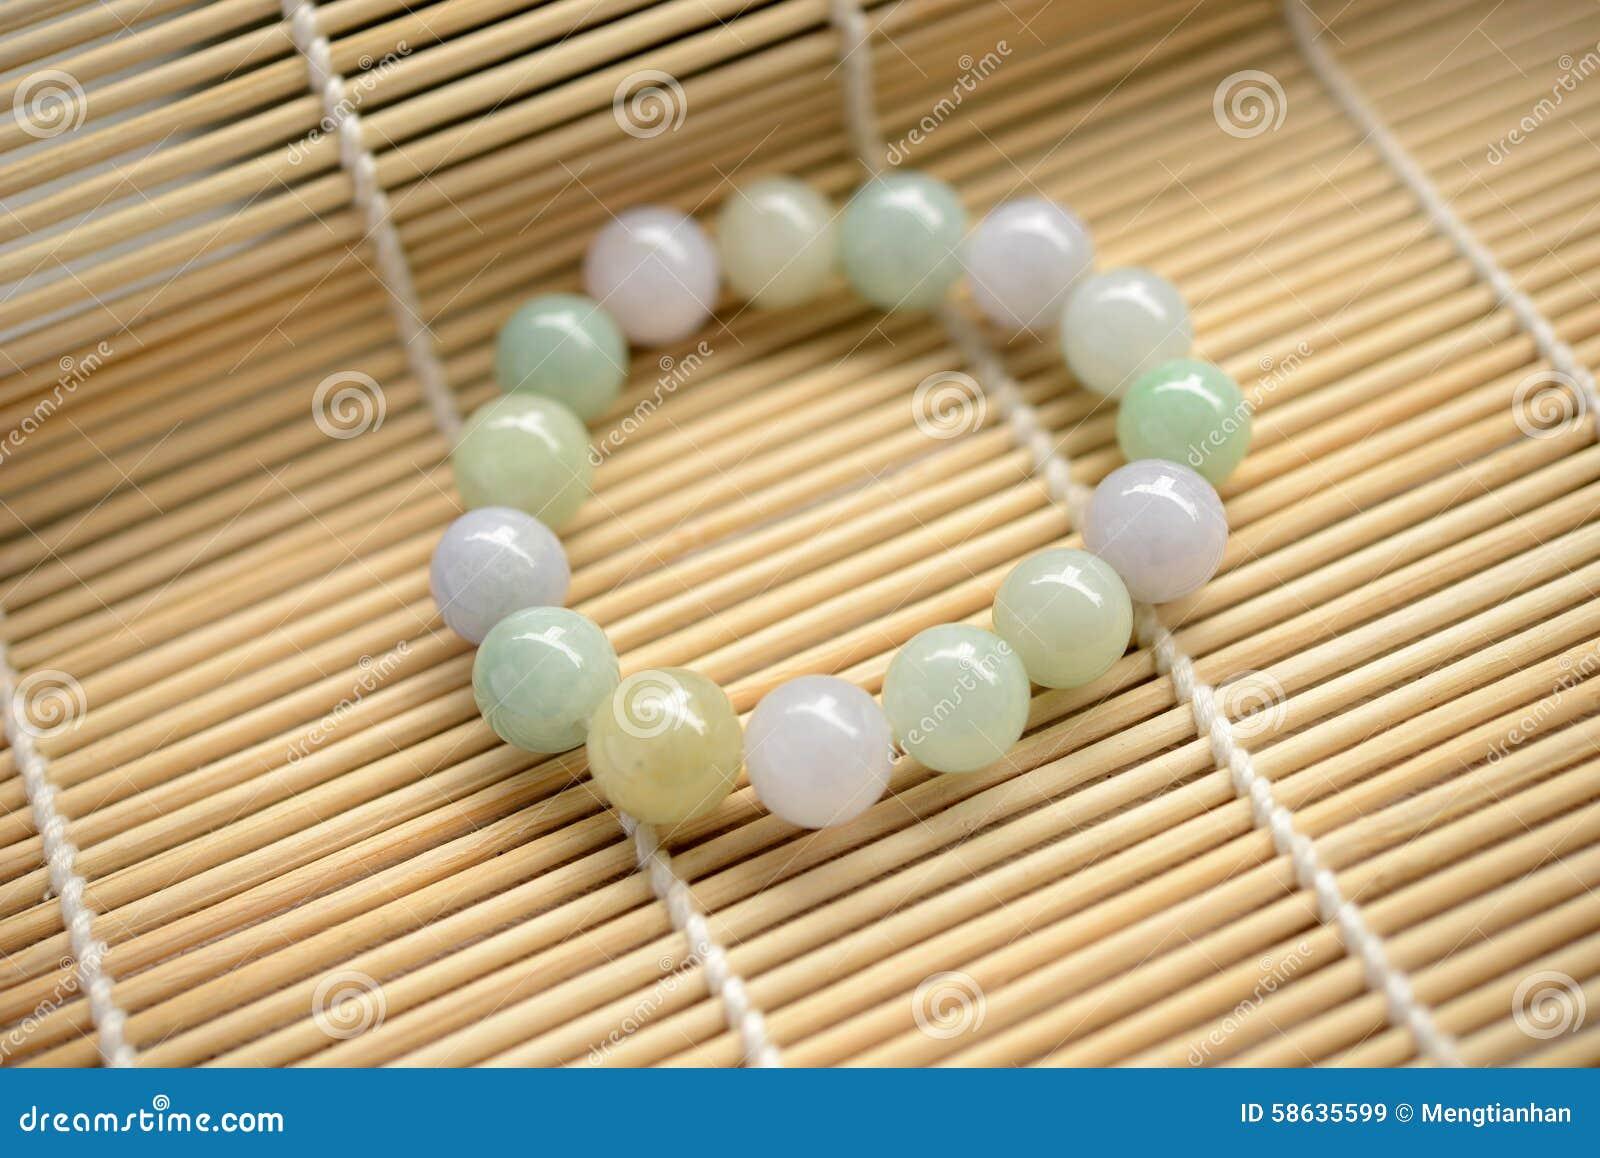 47a61ebc67c82 Bracelet of jade beads stock image. Image of life, beauty - 58635599